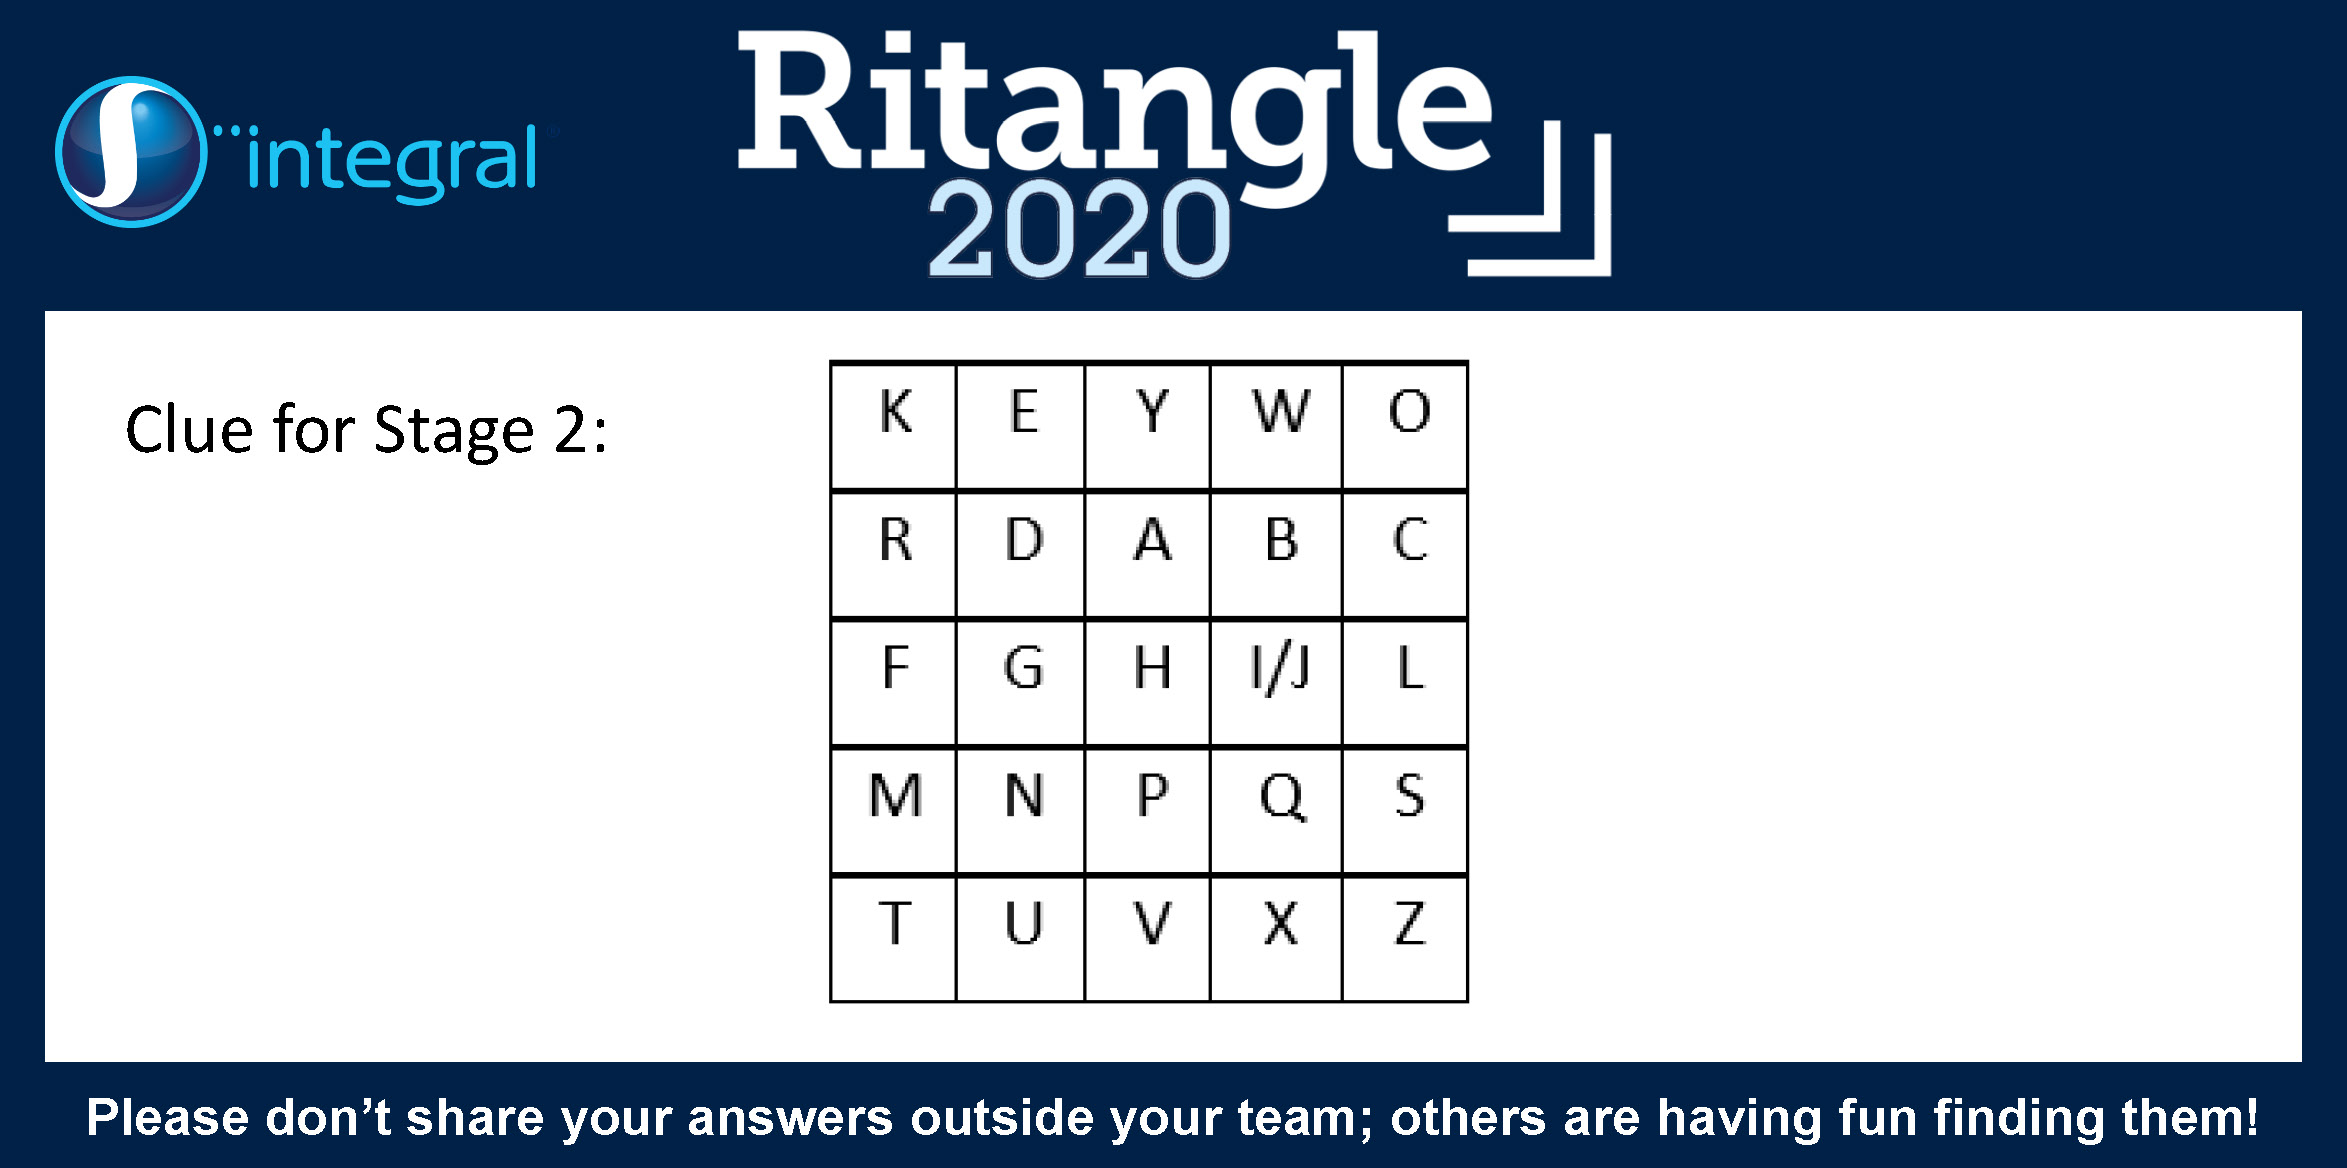 Ritangle2020 clue 2